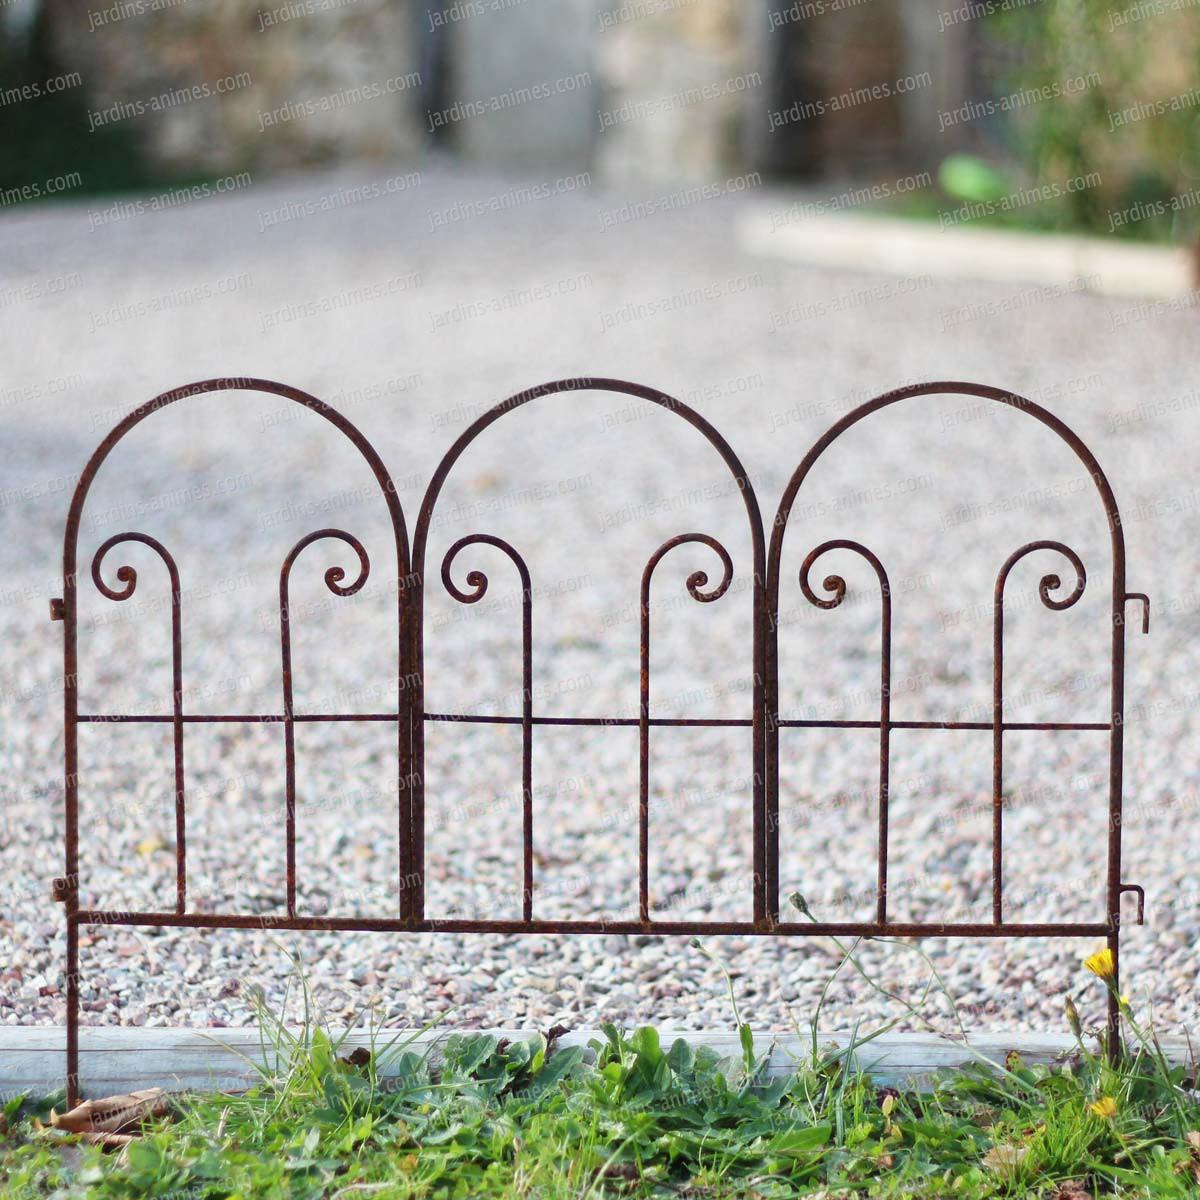 Bordure arceaux en fer brut bordure de jardin - Petite bordure de jardin ...